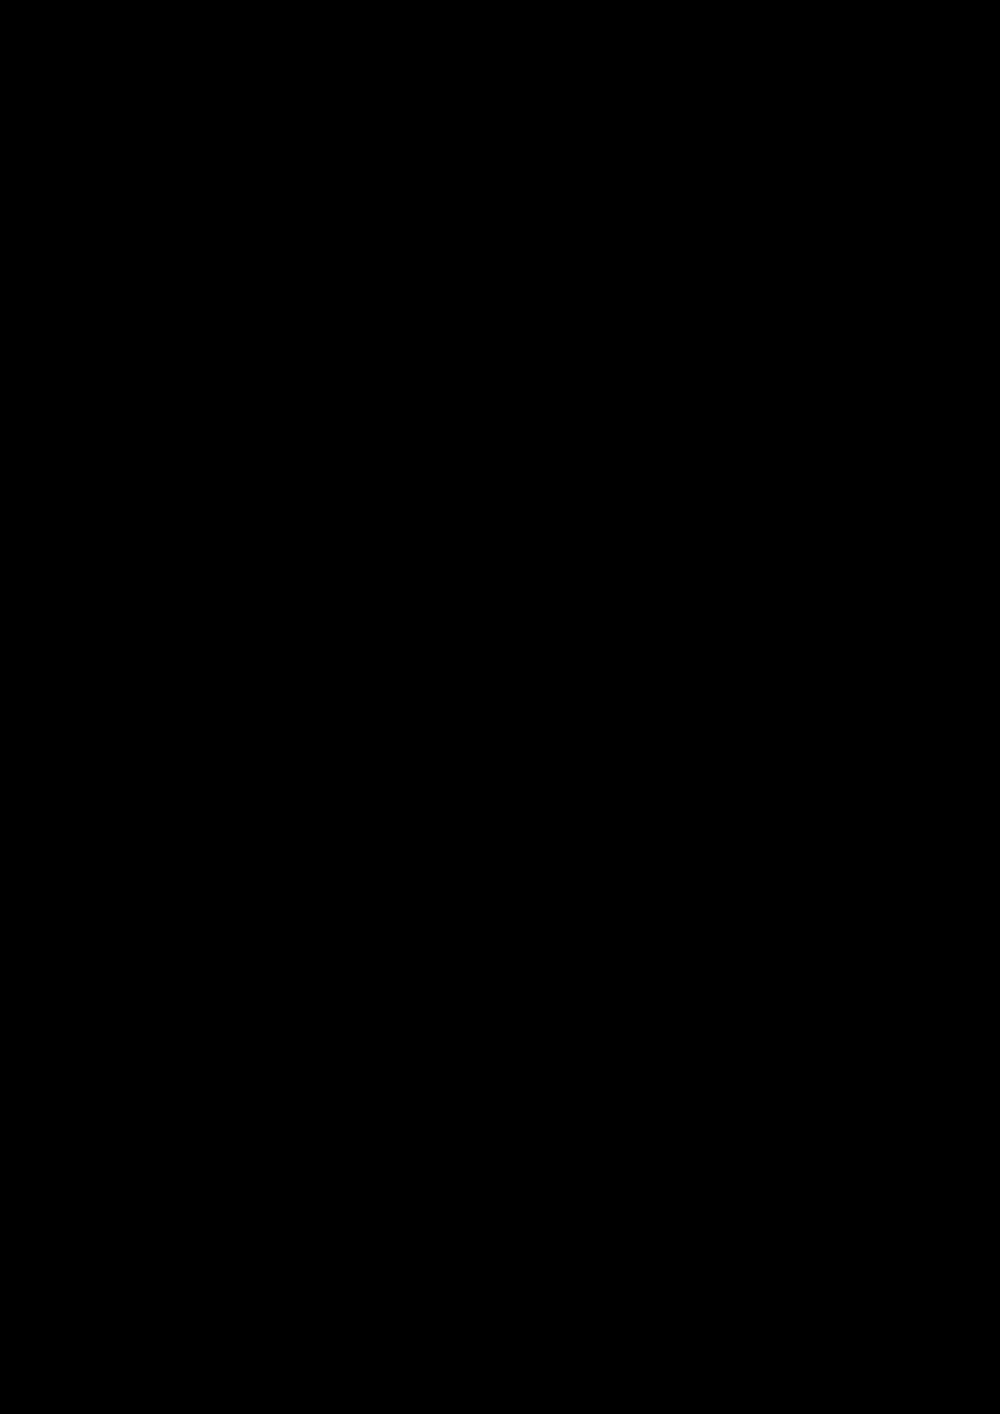 lic17-002